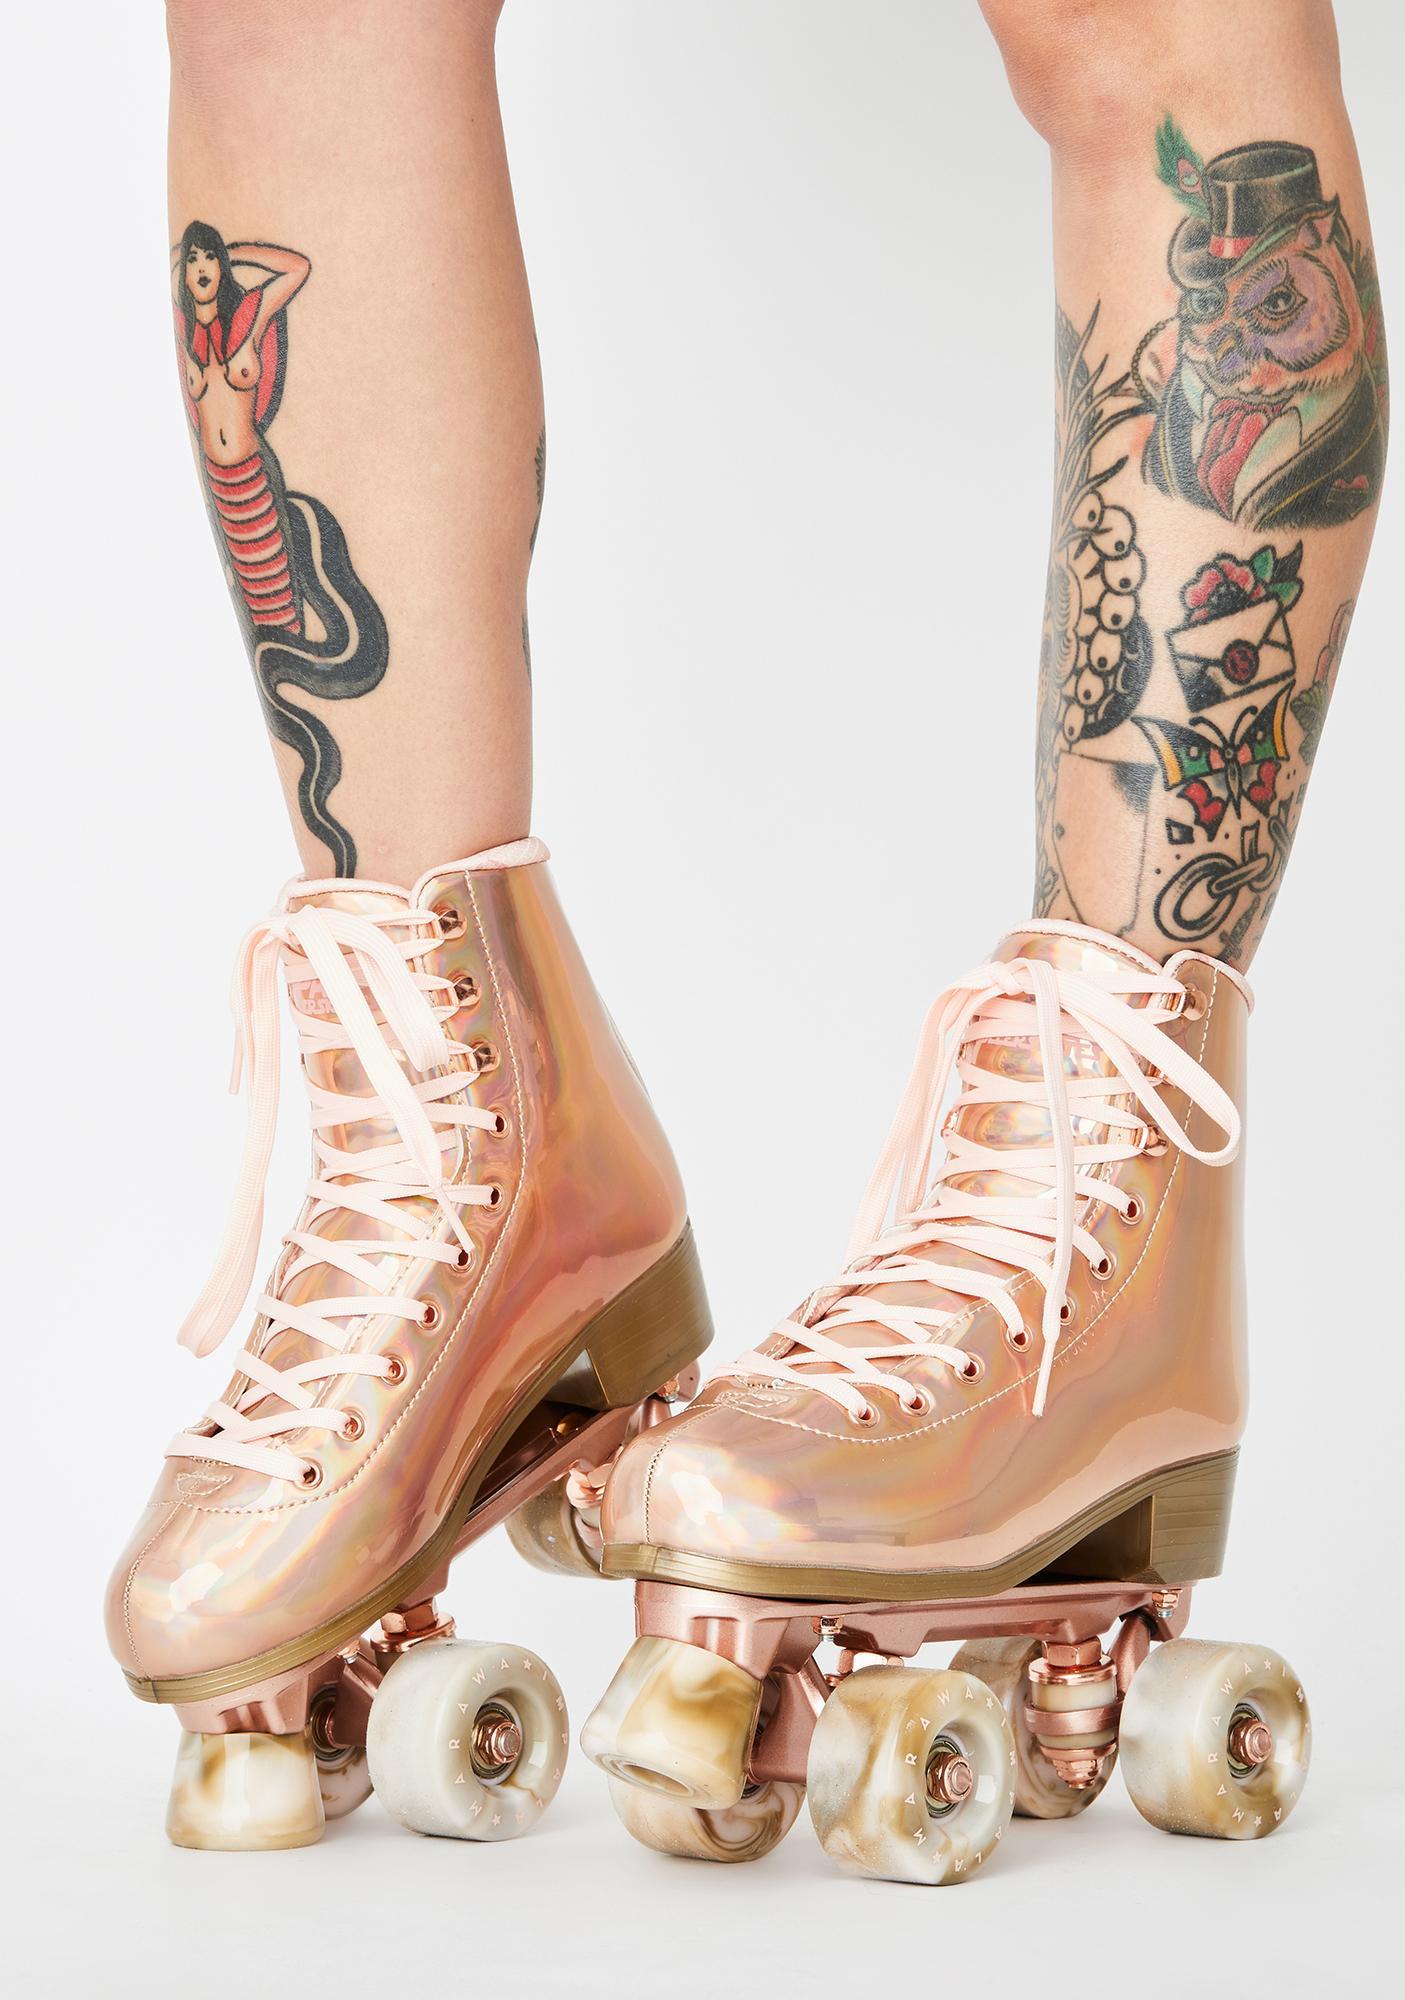 Size: 8 Quad Roller SkatesVegan Rose Gold WomensMarwa Impala